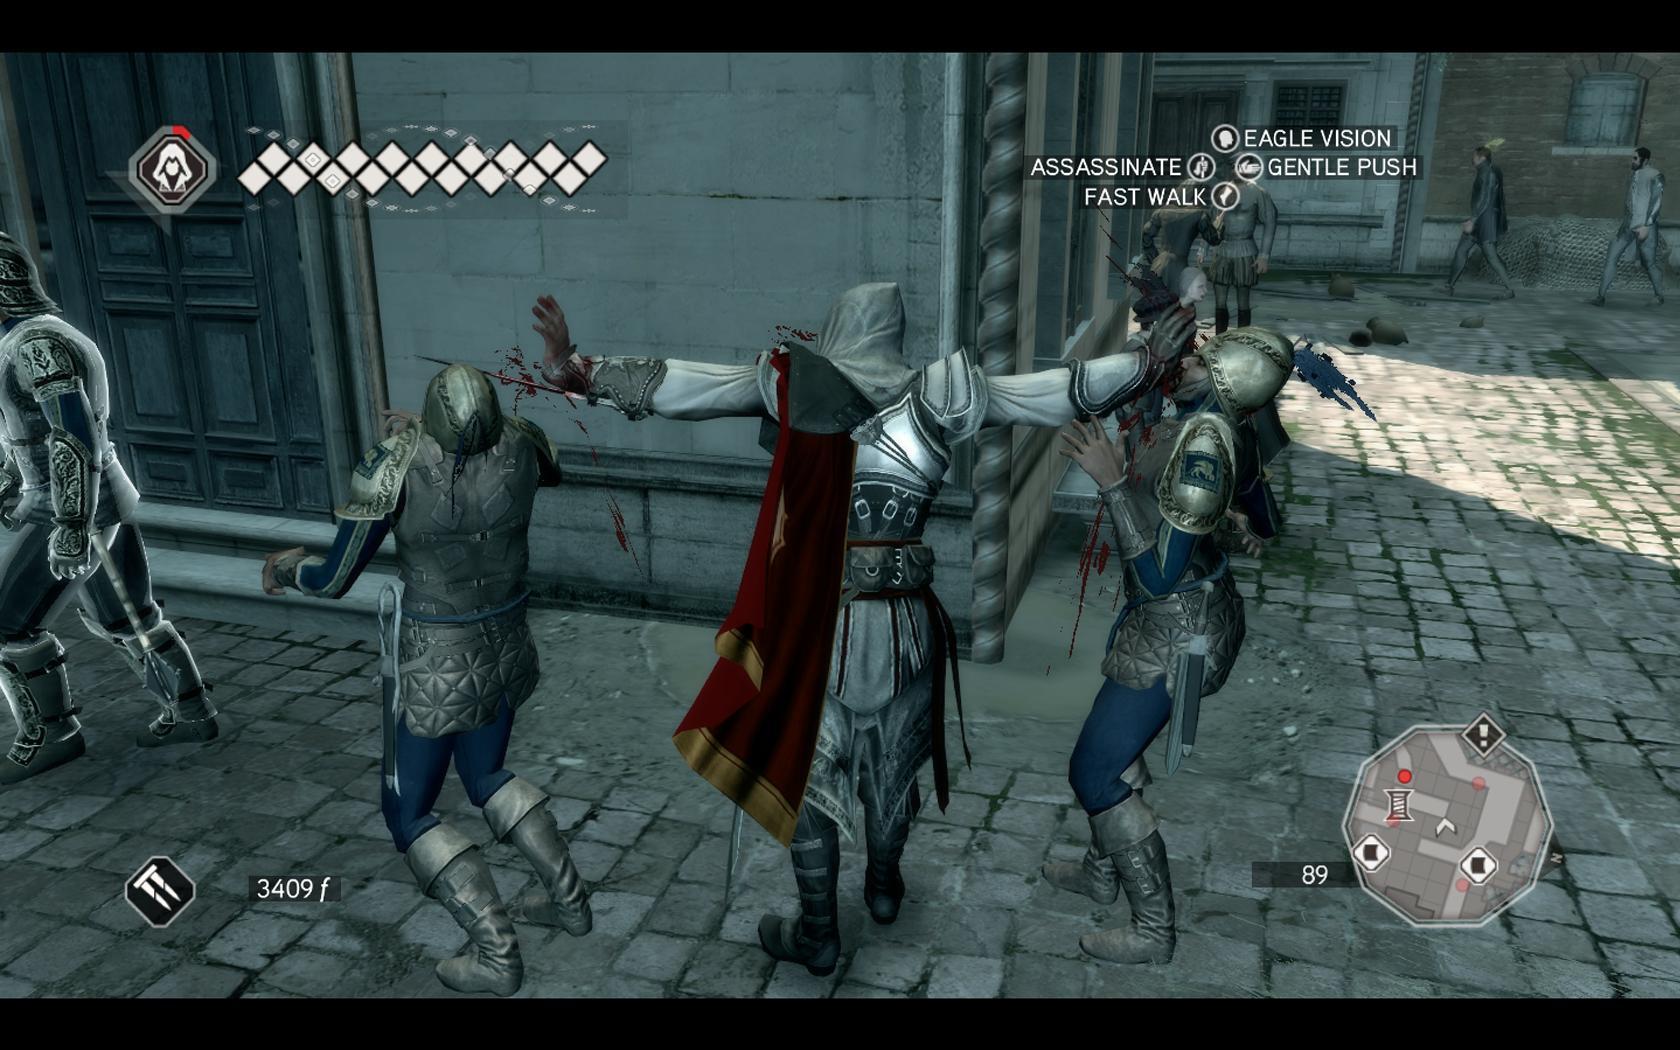 http://onyxgame.com/img/game/assassins-creed-2/screenshots/assassins-creed-2-image-screenshot-8.jpg